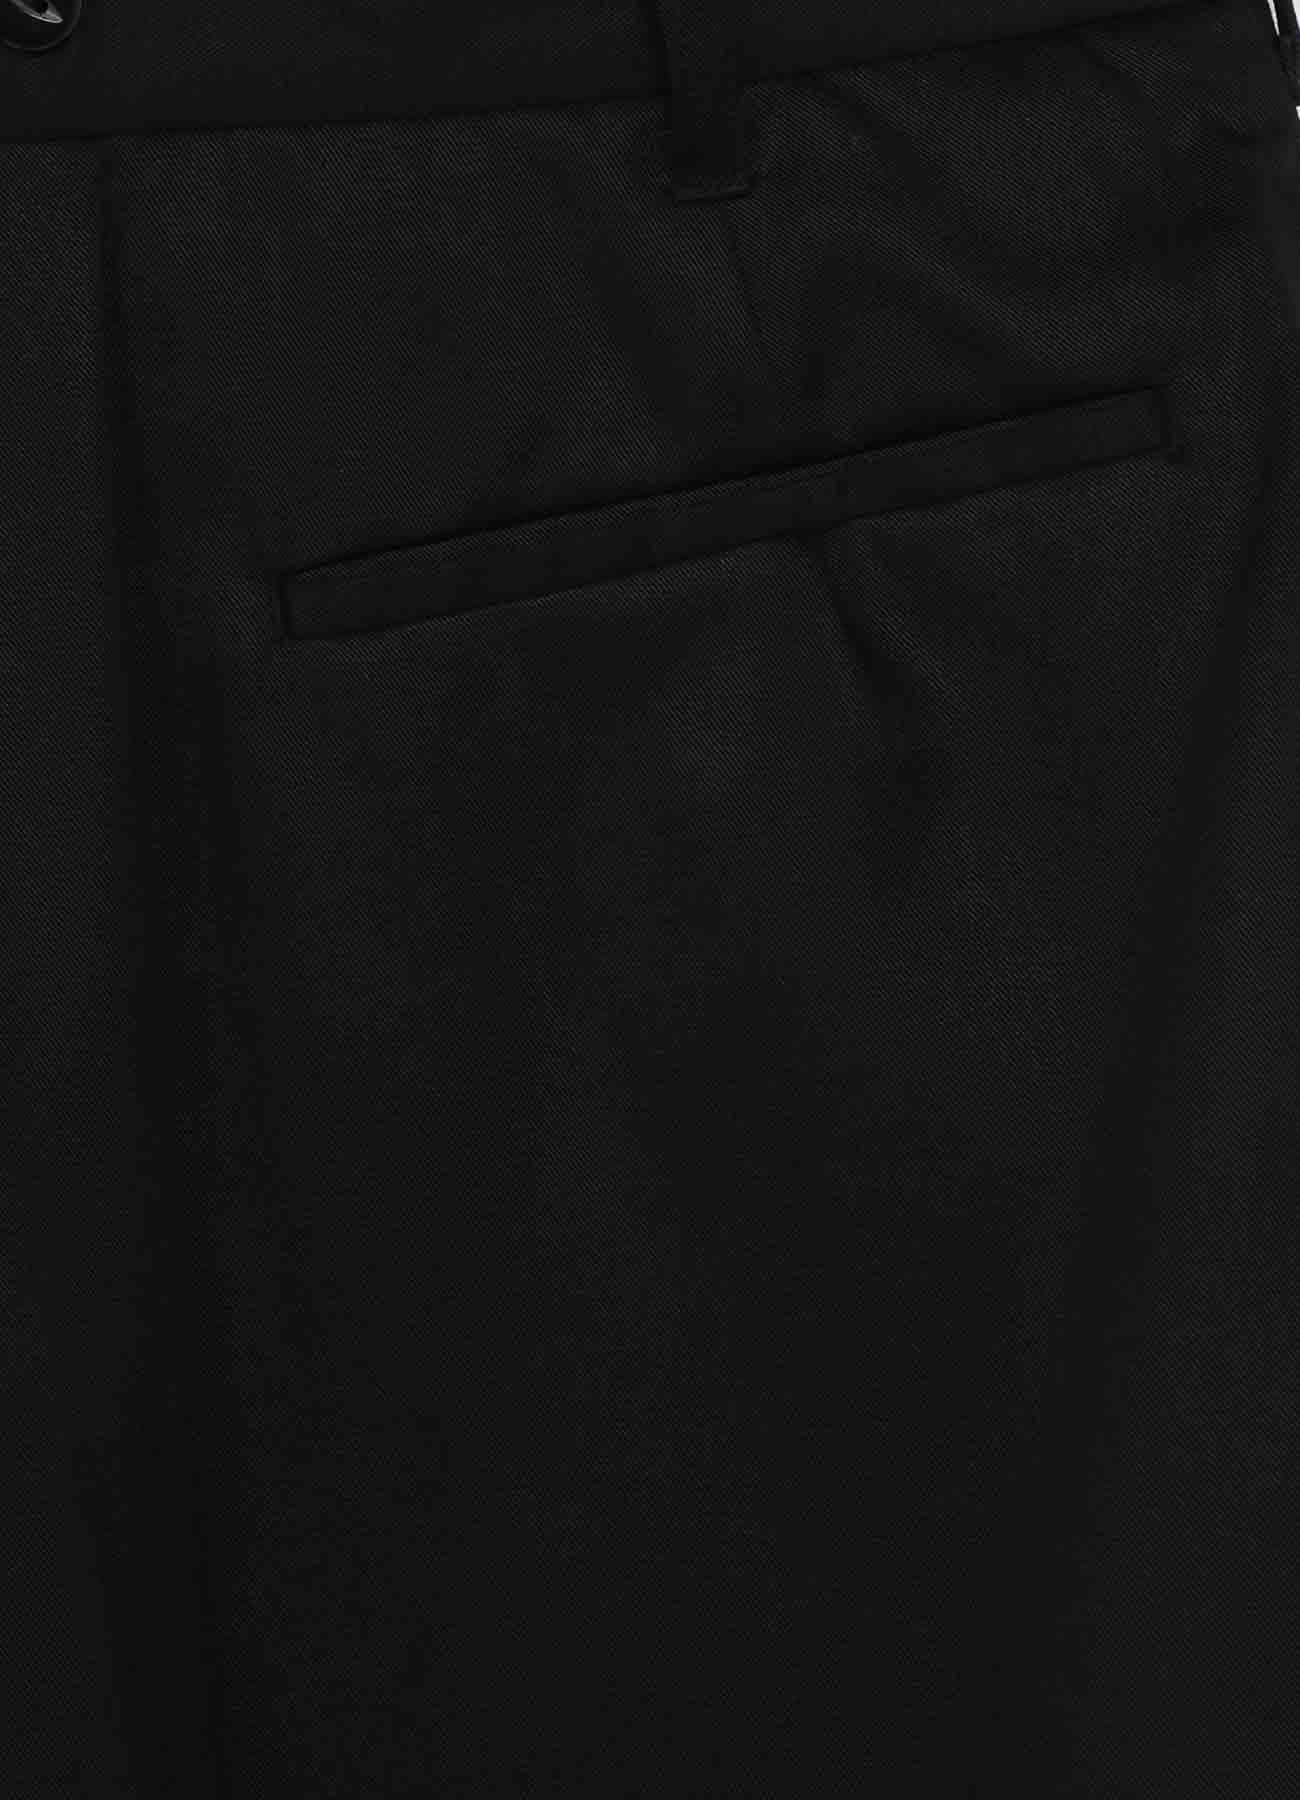 CHINO CLOTH POCKET SAROUEL